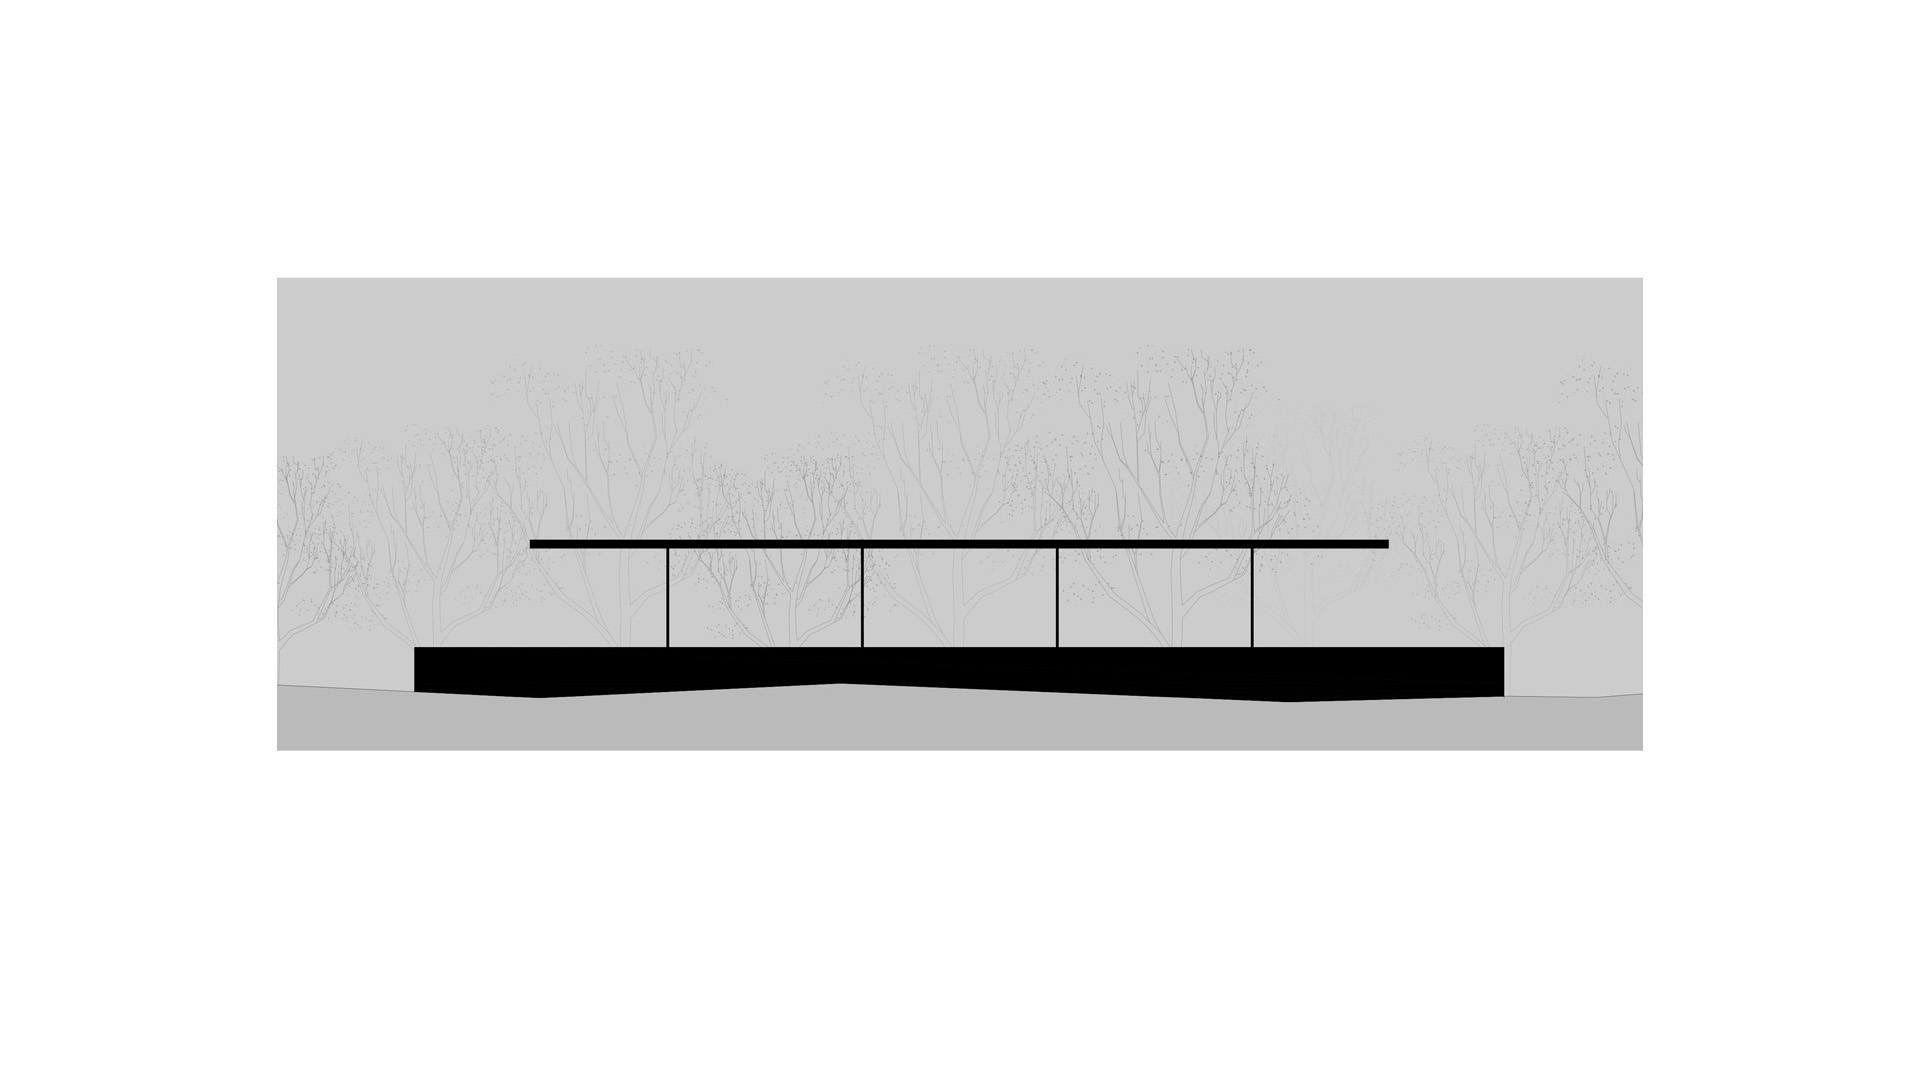 fundacao-ralston-semler-corte-plato copy